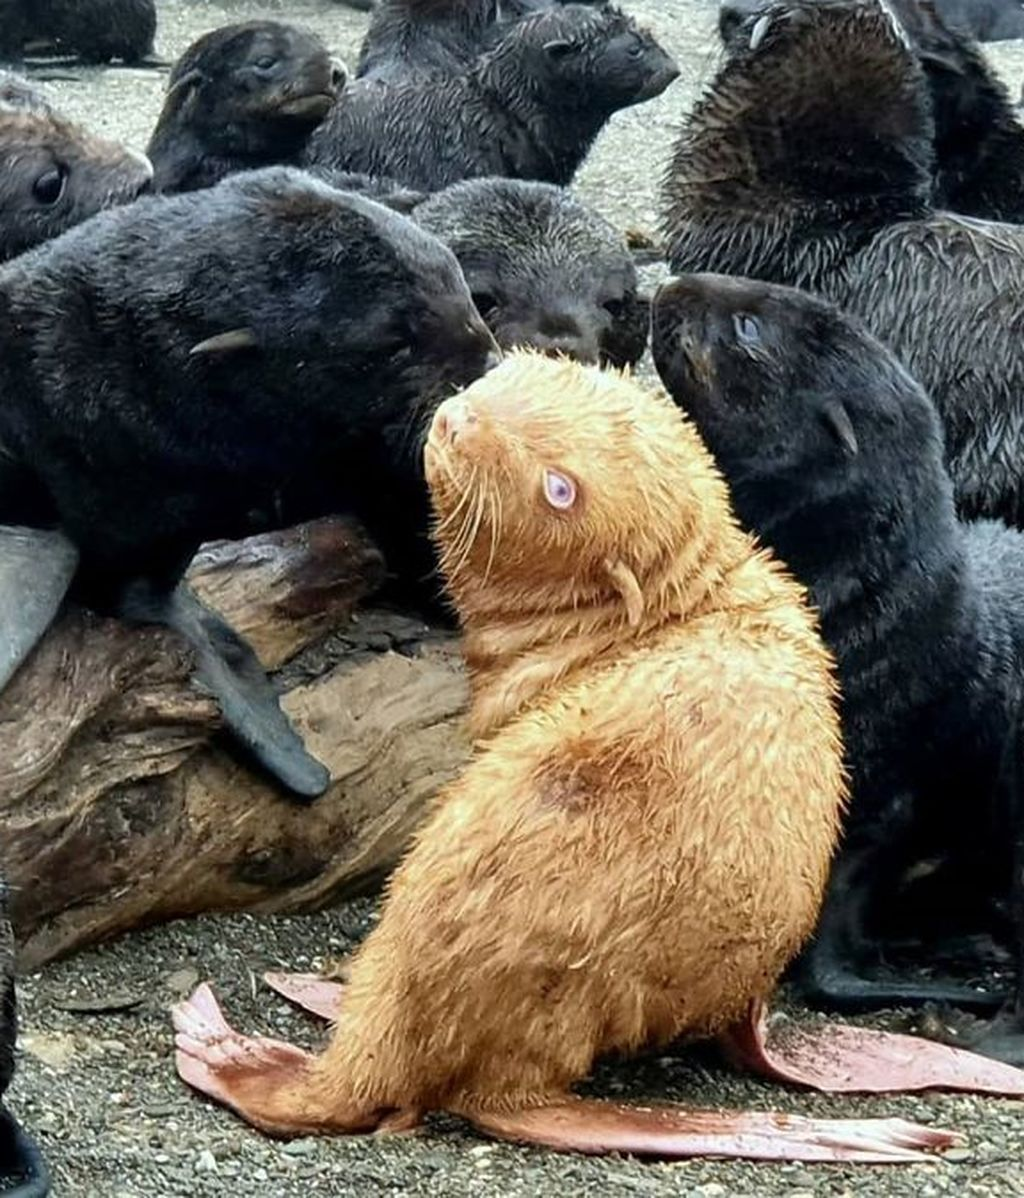 ginger-seal-albino-russia-tyuleny-island-5f59db371cec5__700